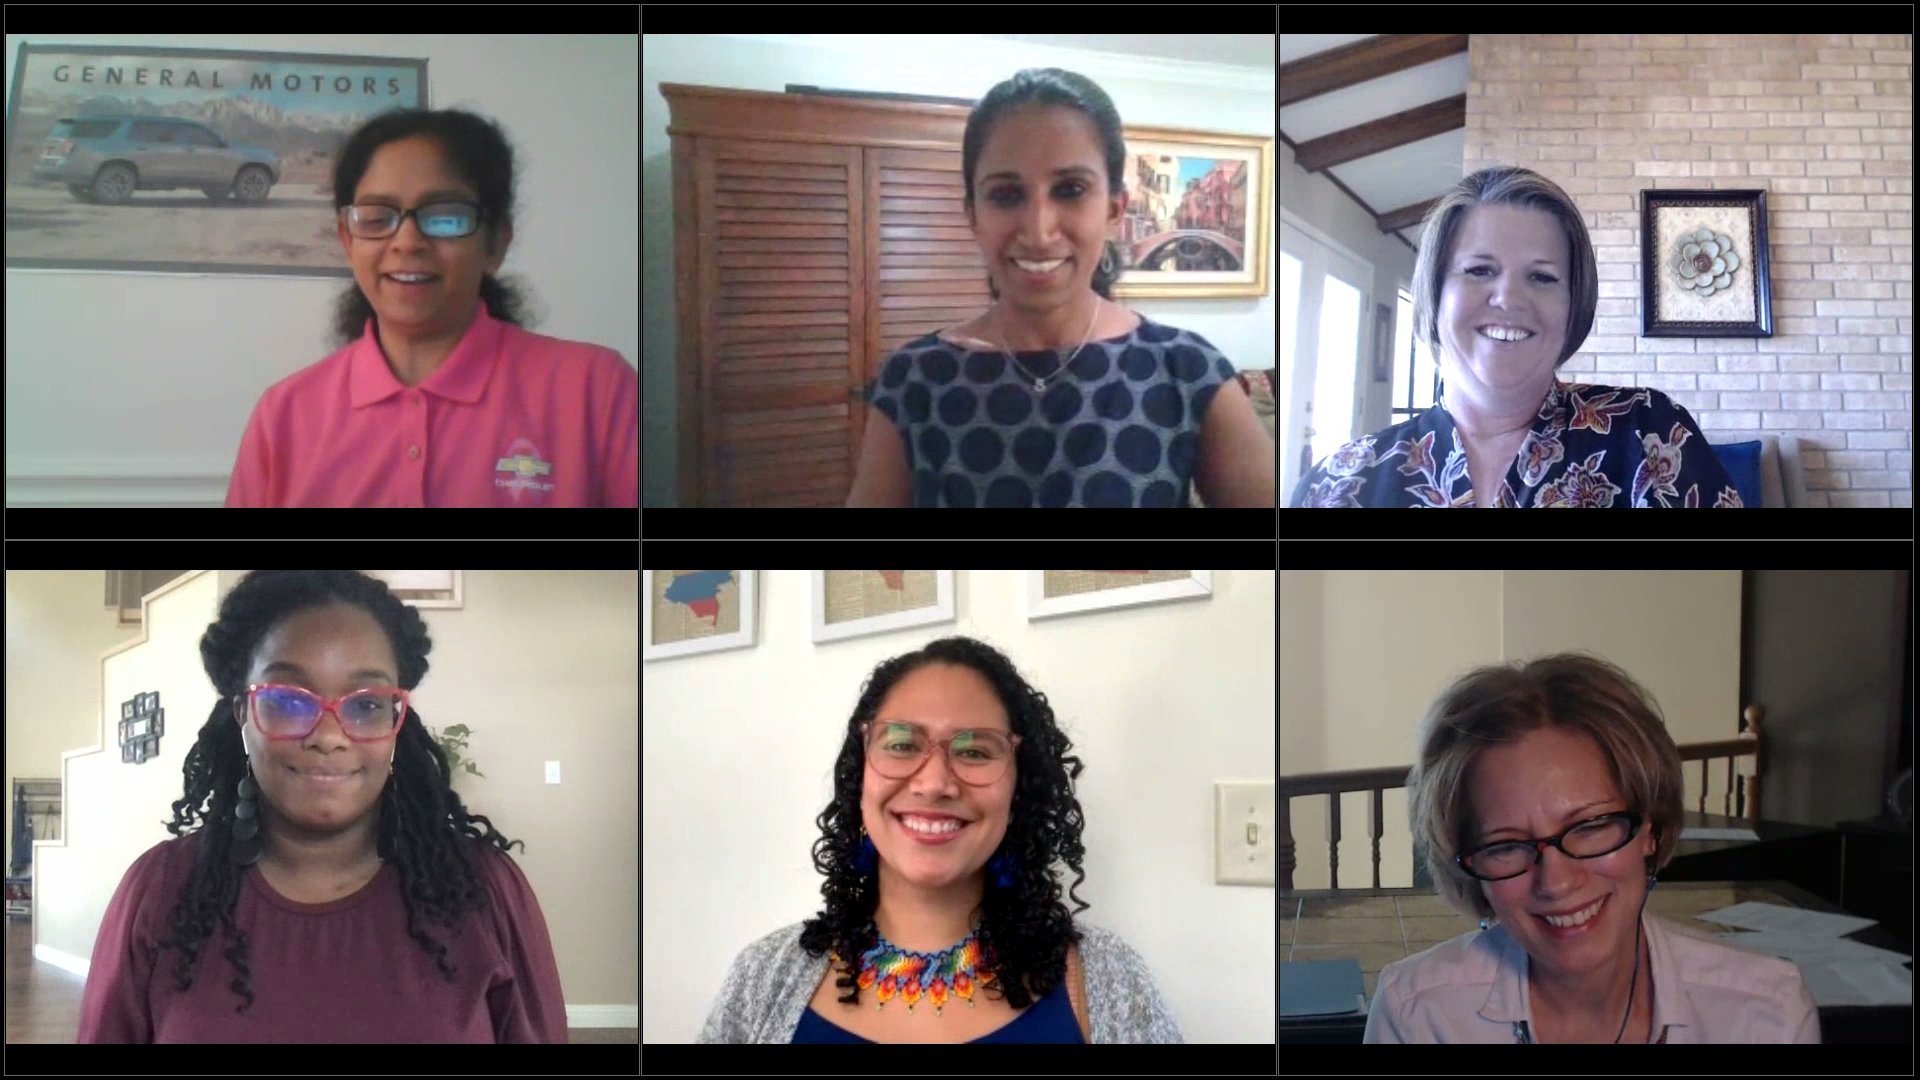 Clockwise from top left: Anbu Subramaniyan, Sabari Raja, Andi McNair, Jennifer Harrison (moderator), Ana Porras, Nicole Jackson.